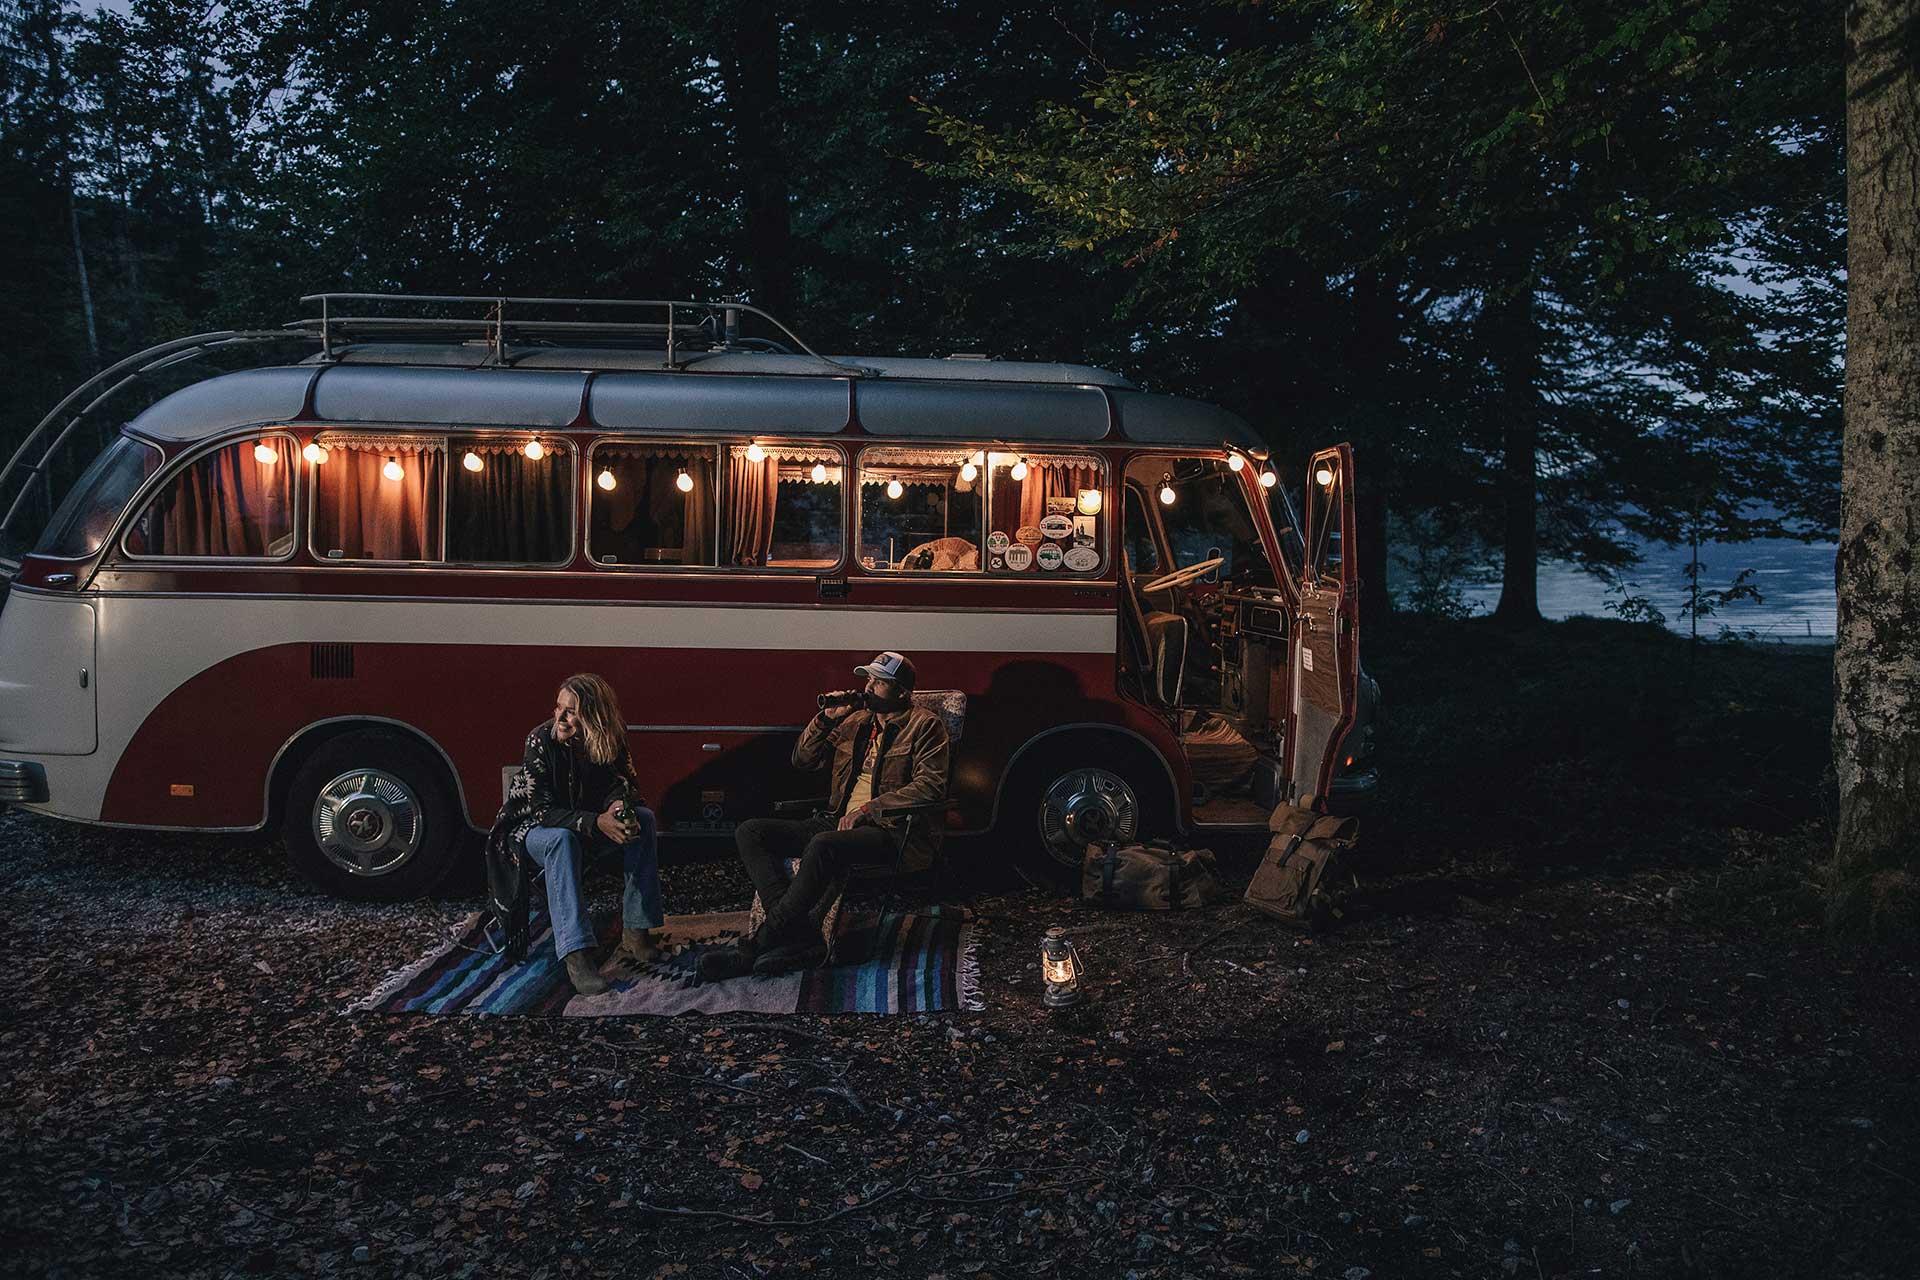 Fotoproduktion Camping Lifestyle People Fotograf Berlin